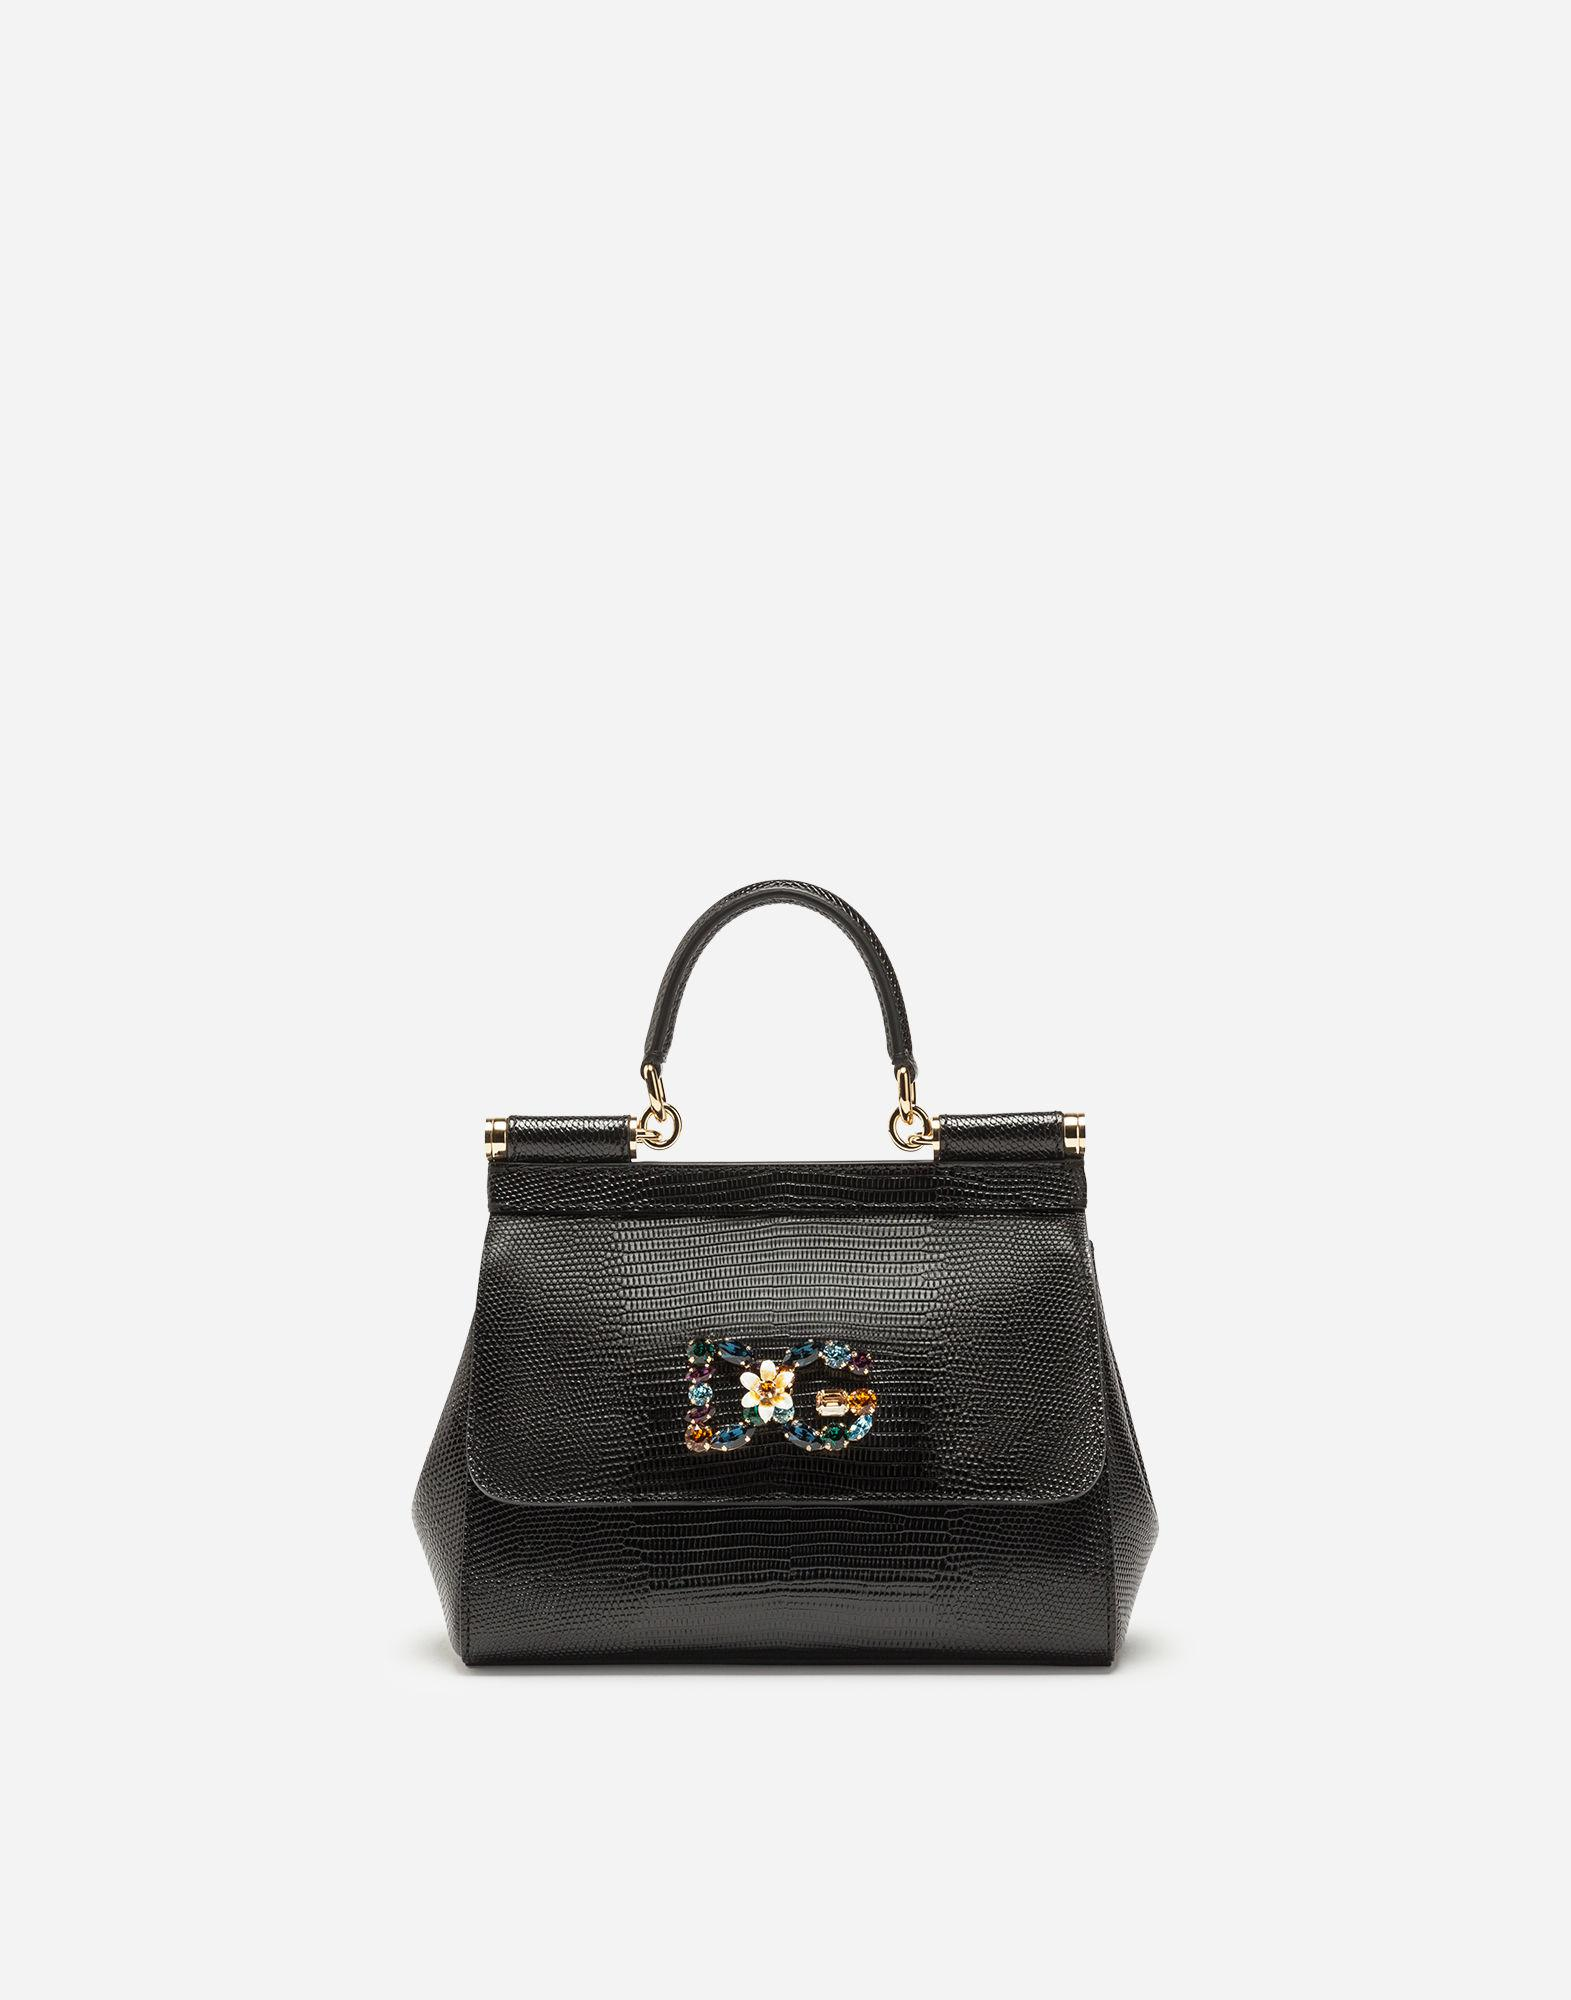 Lyst - Dolce   Gabbana Small Calfskin Sicily Bag With Iguana-print ... b38cc7abed4ca